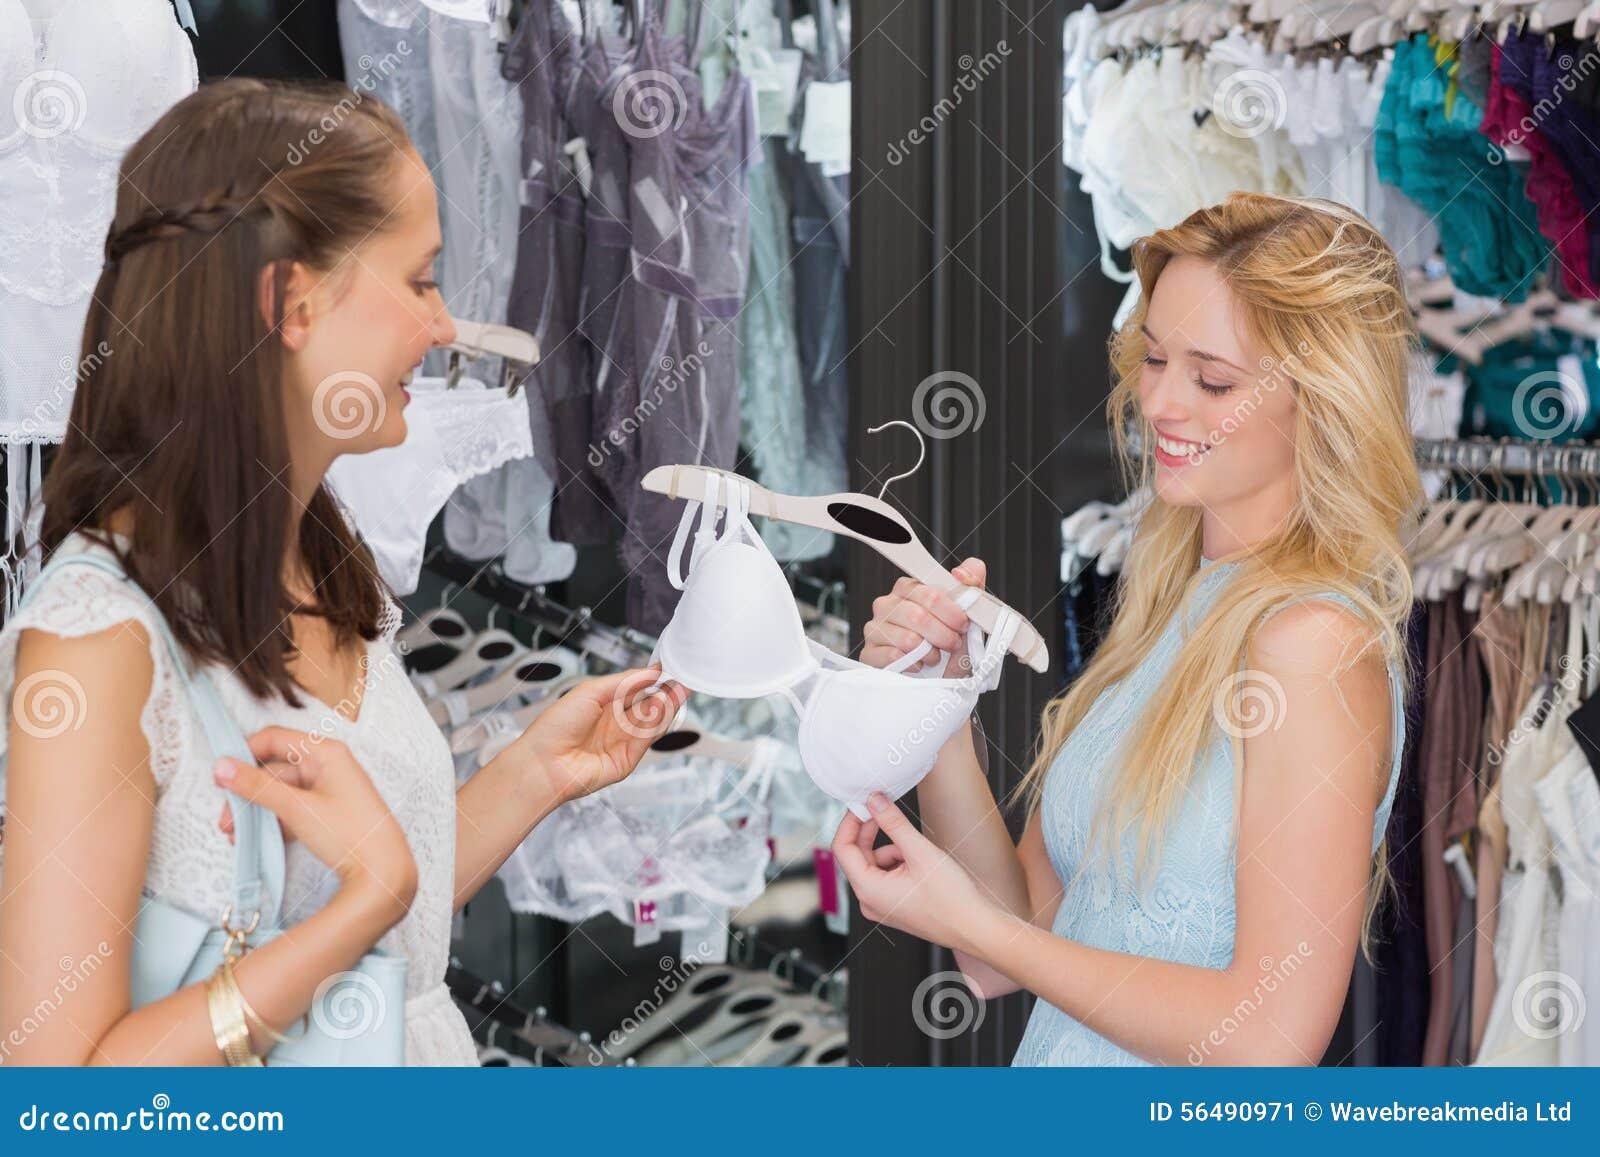 Happy Women Friends Holding Lingerie Stock Photo - Image: 56490971